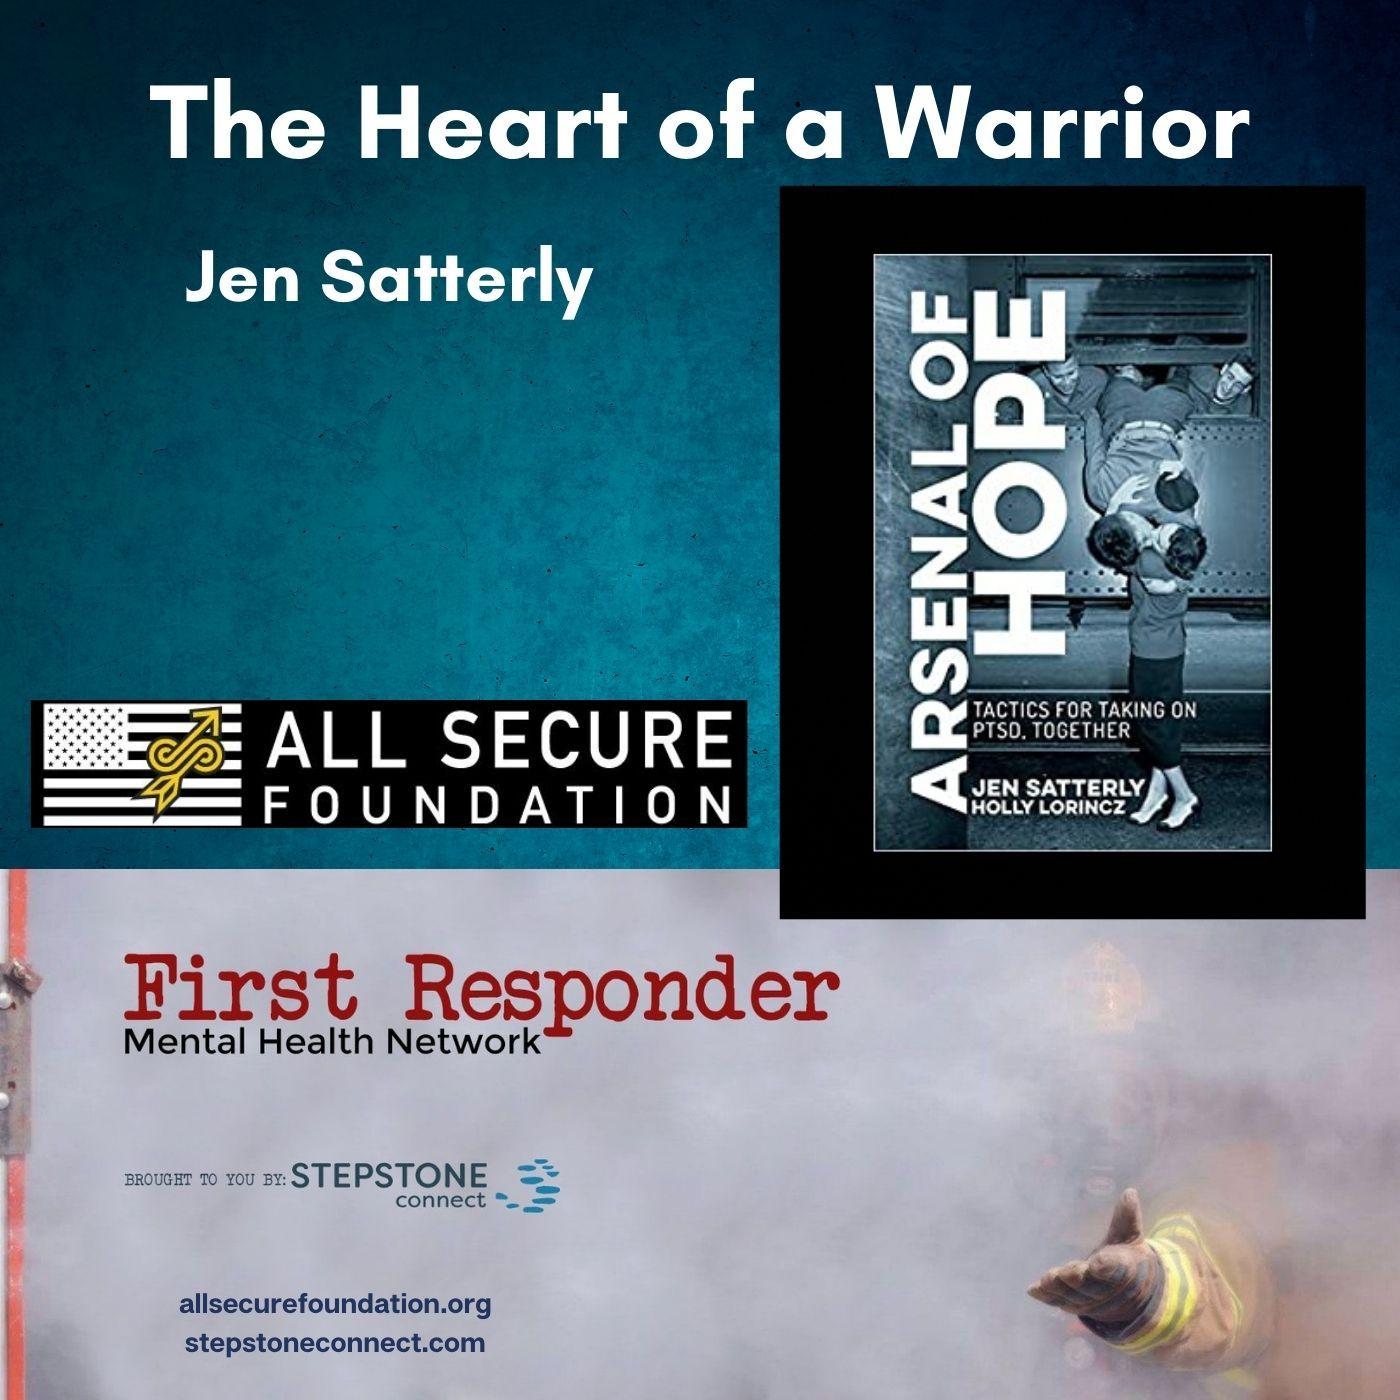 Mental Health News Radio - The Heart of a Warrior